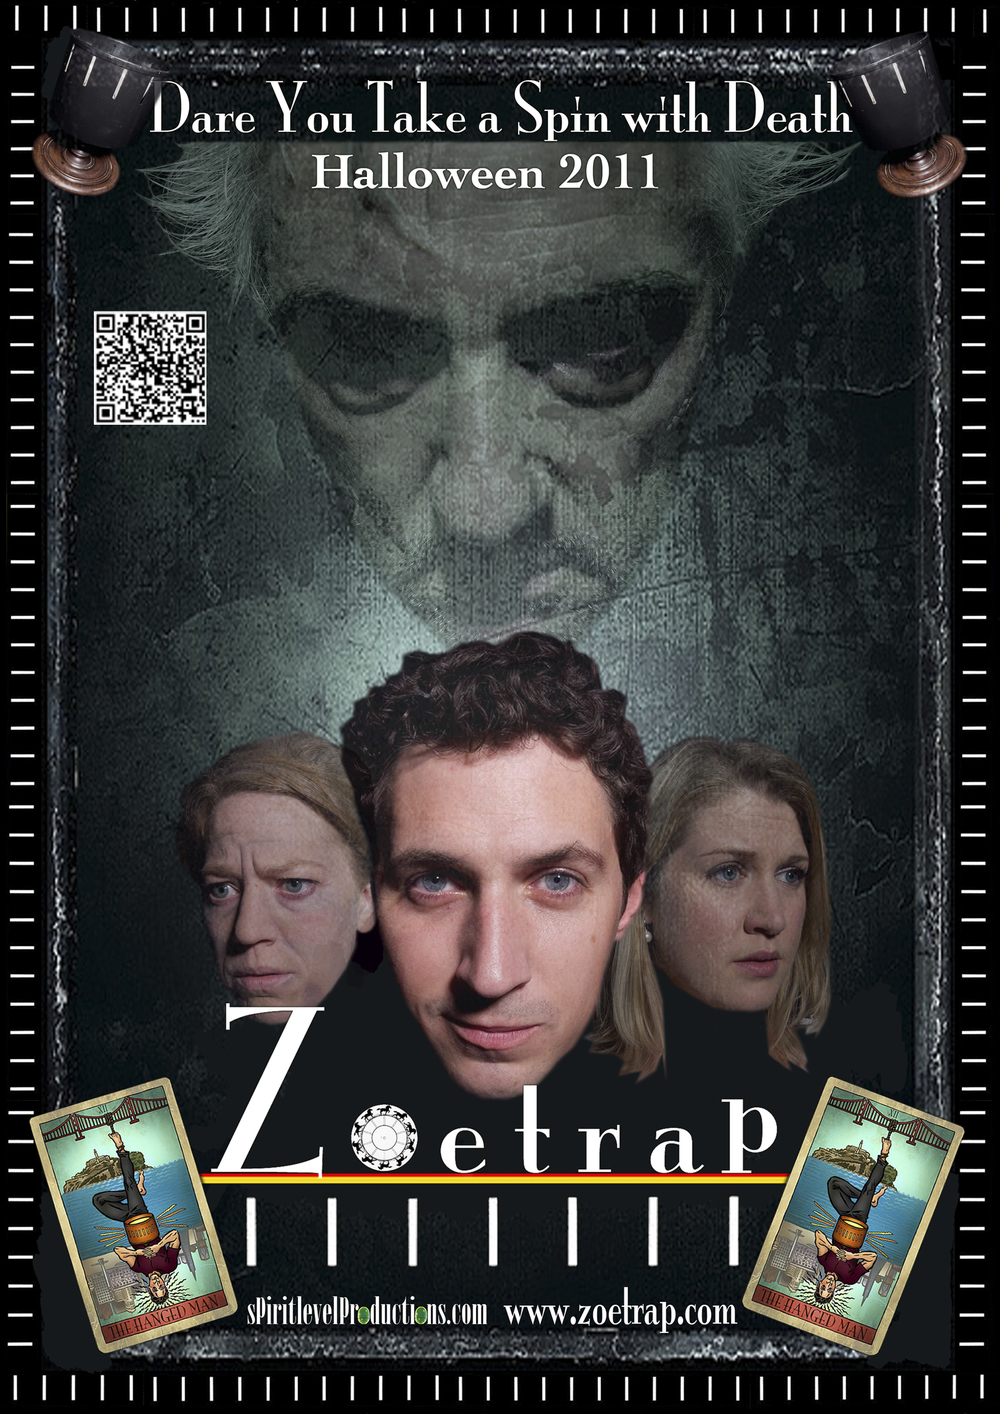 zoetrap-poster-final-email-qr.jpg